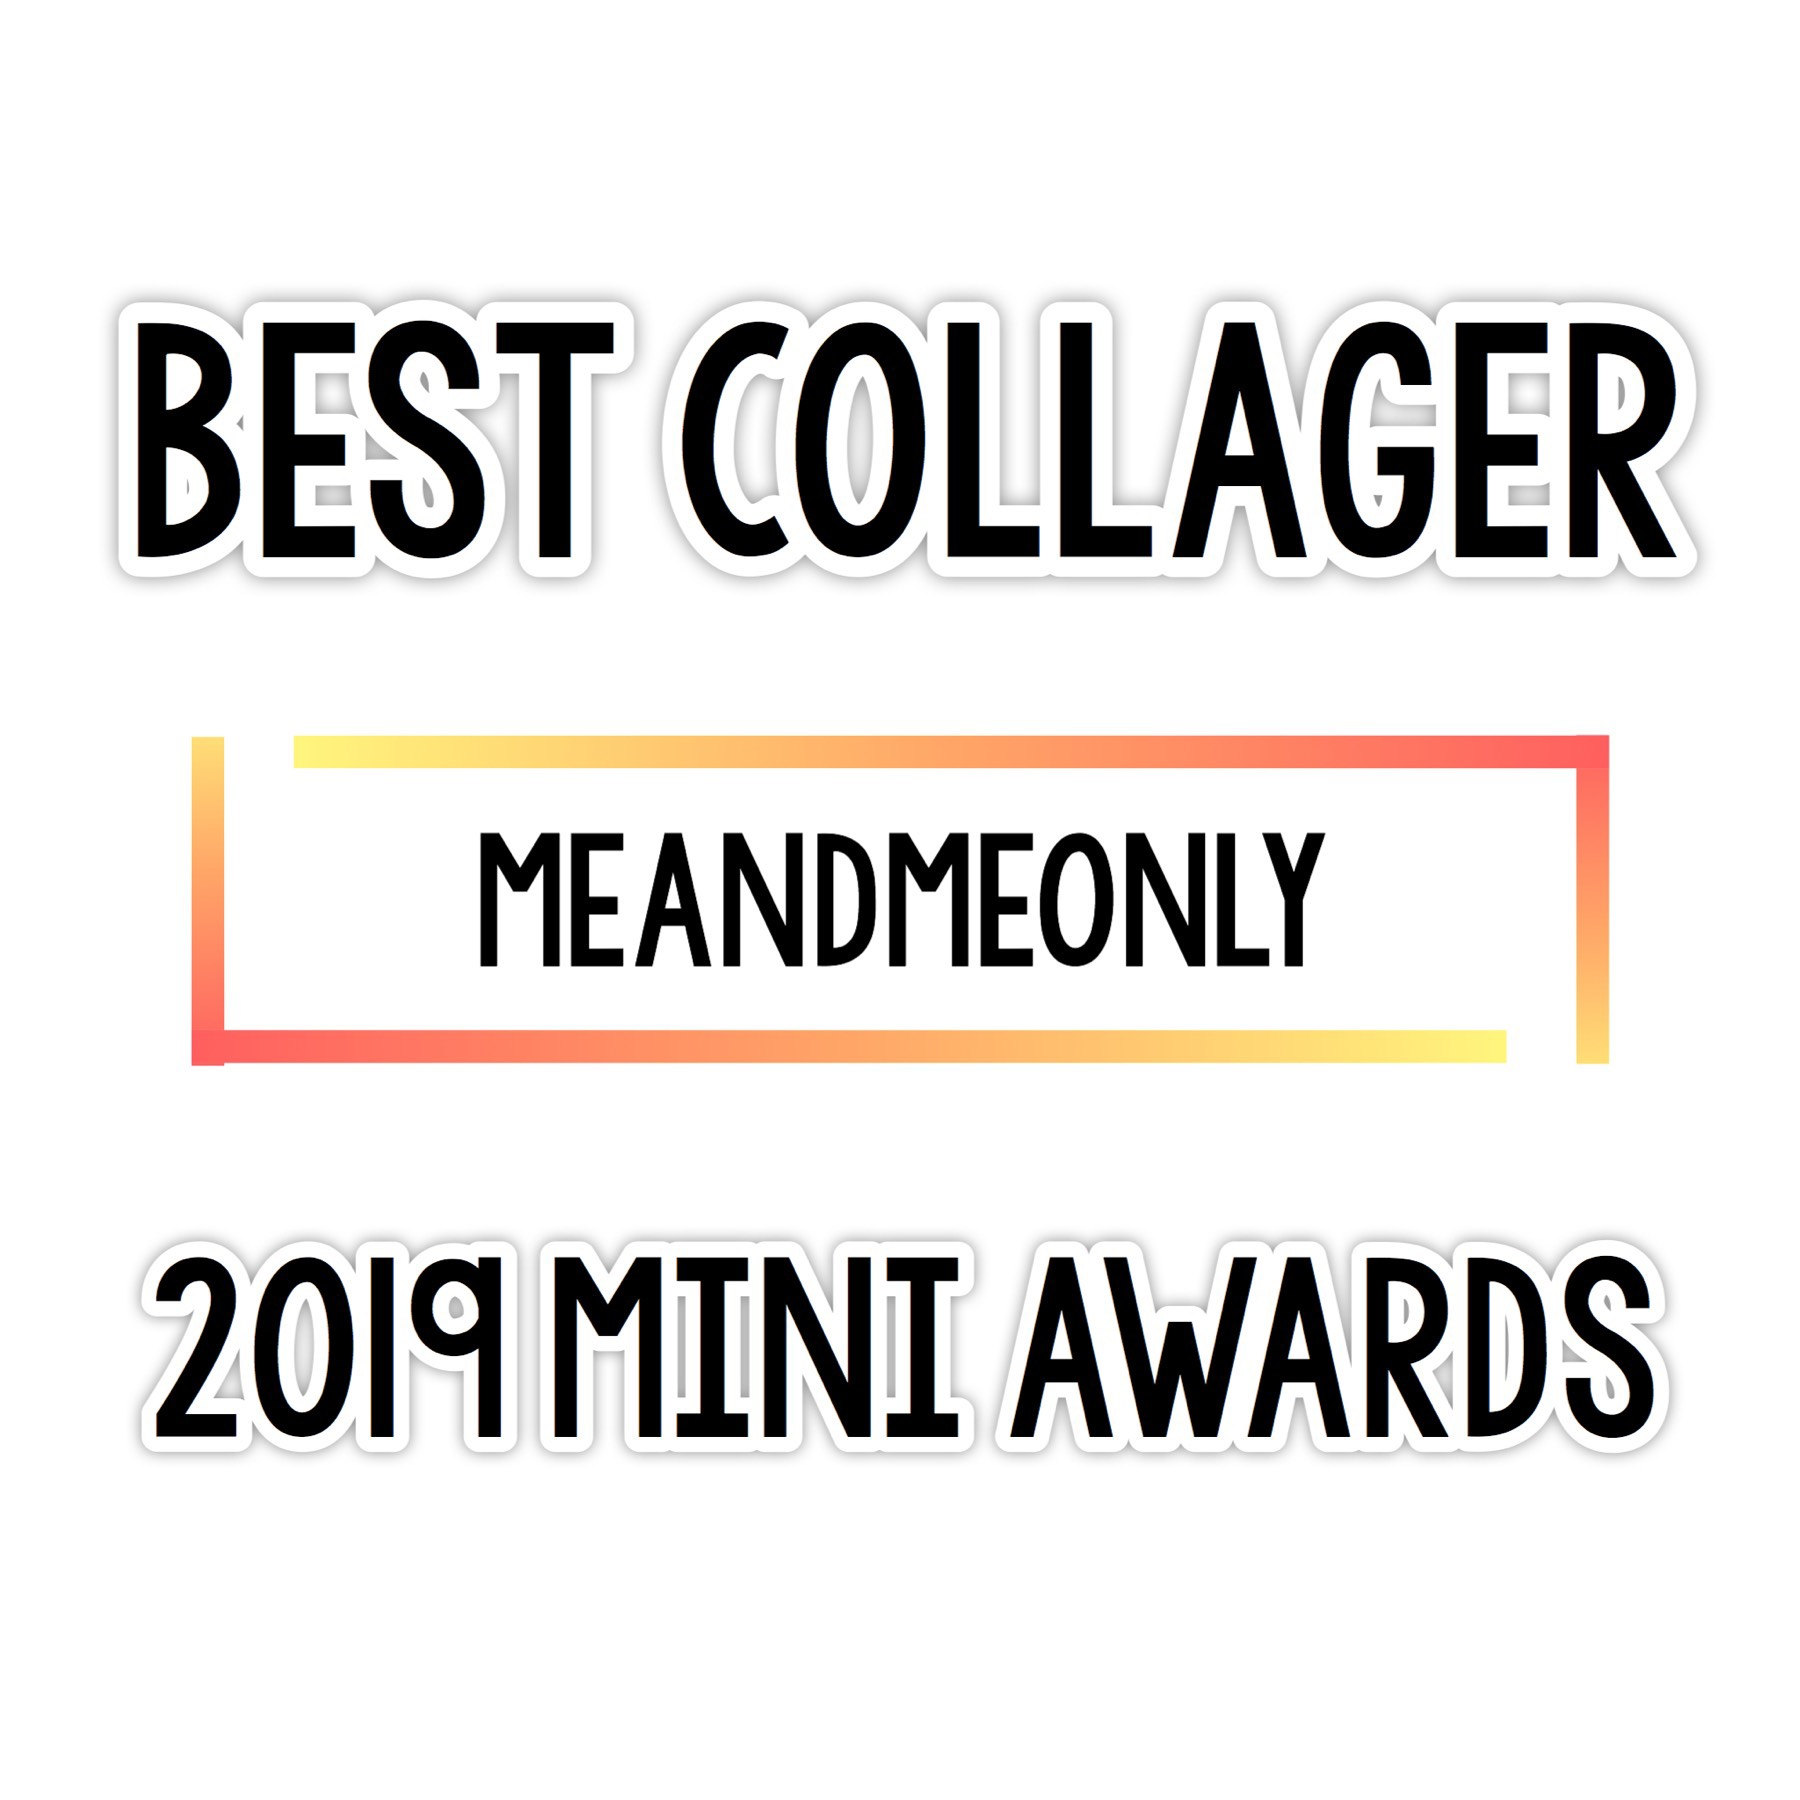 Congratulations meandmeonly !